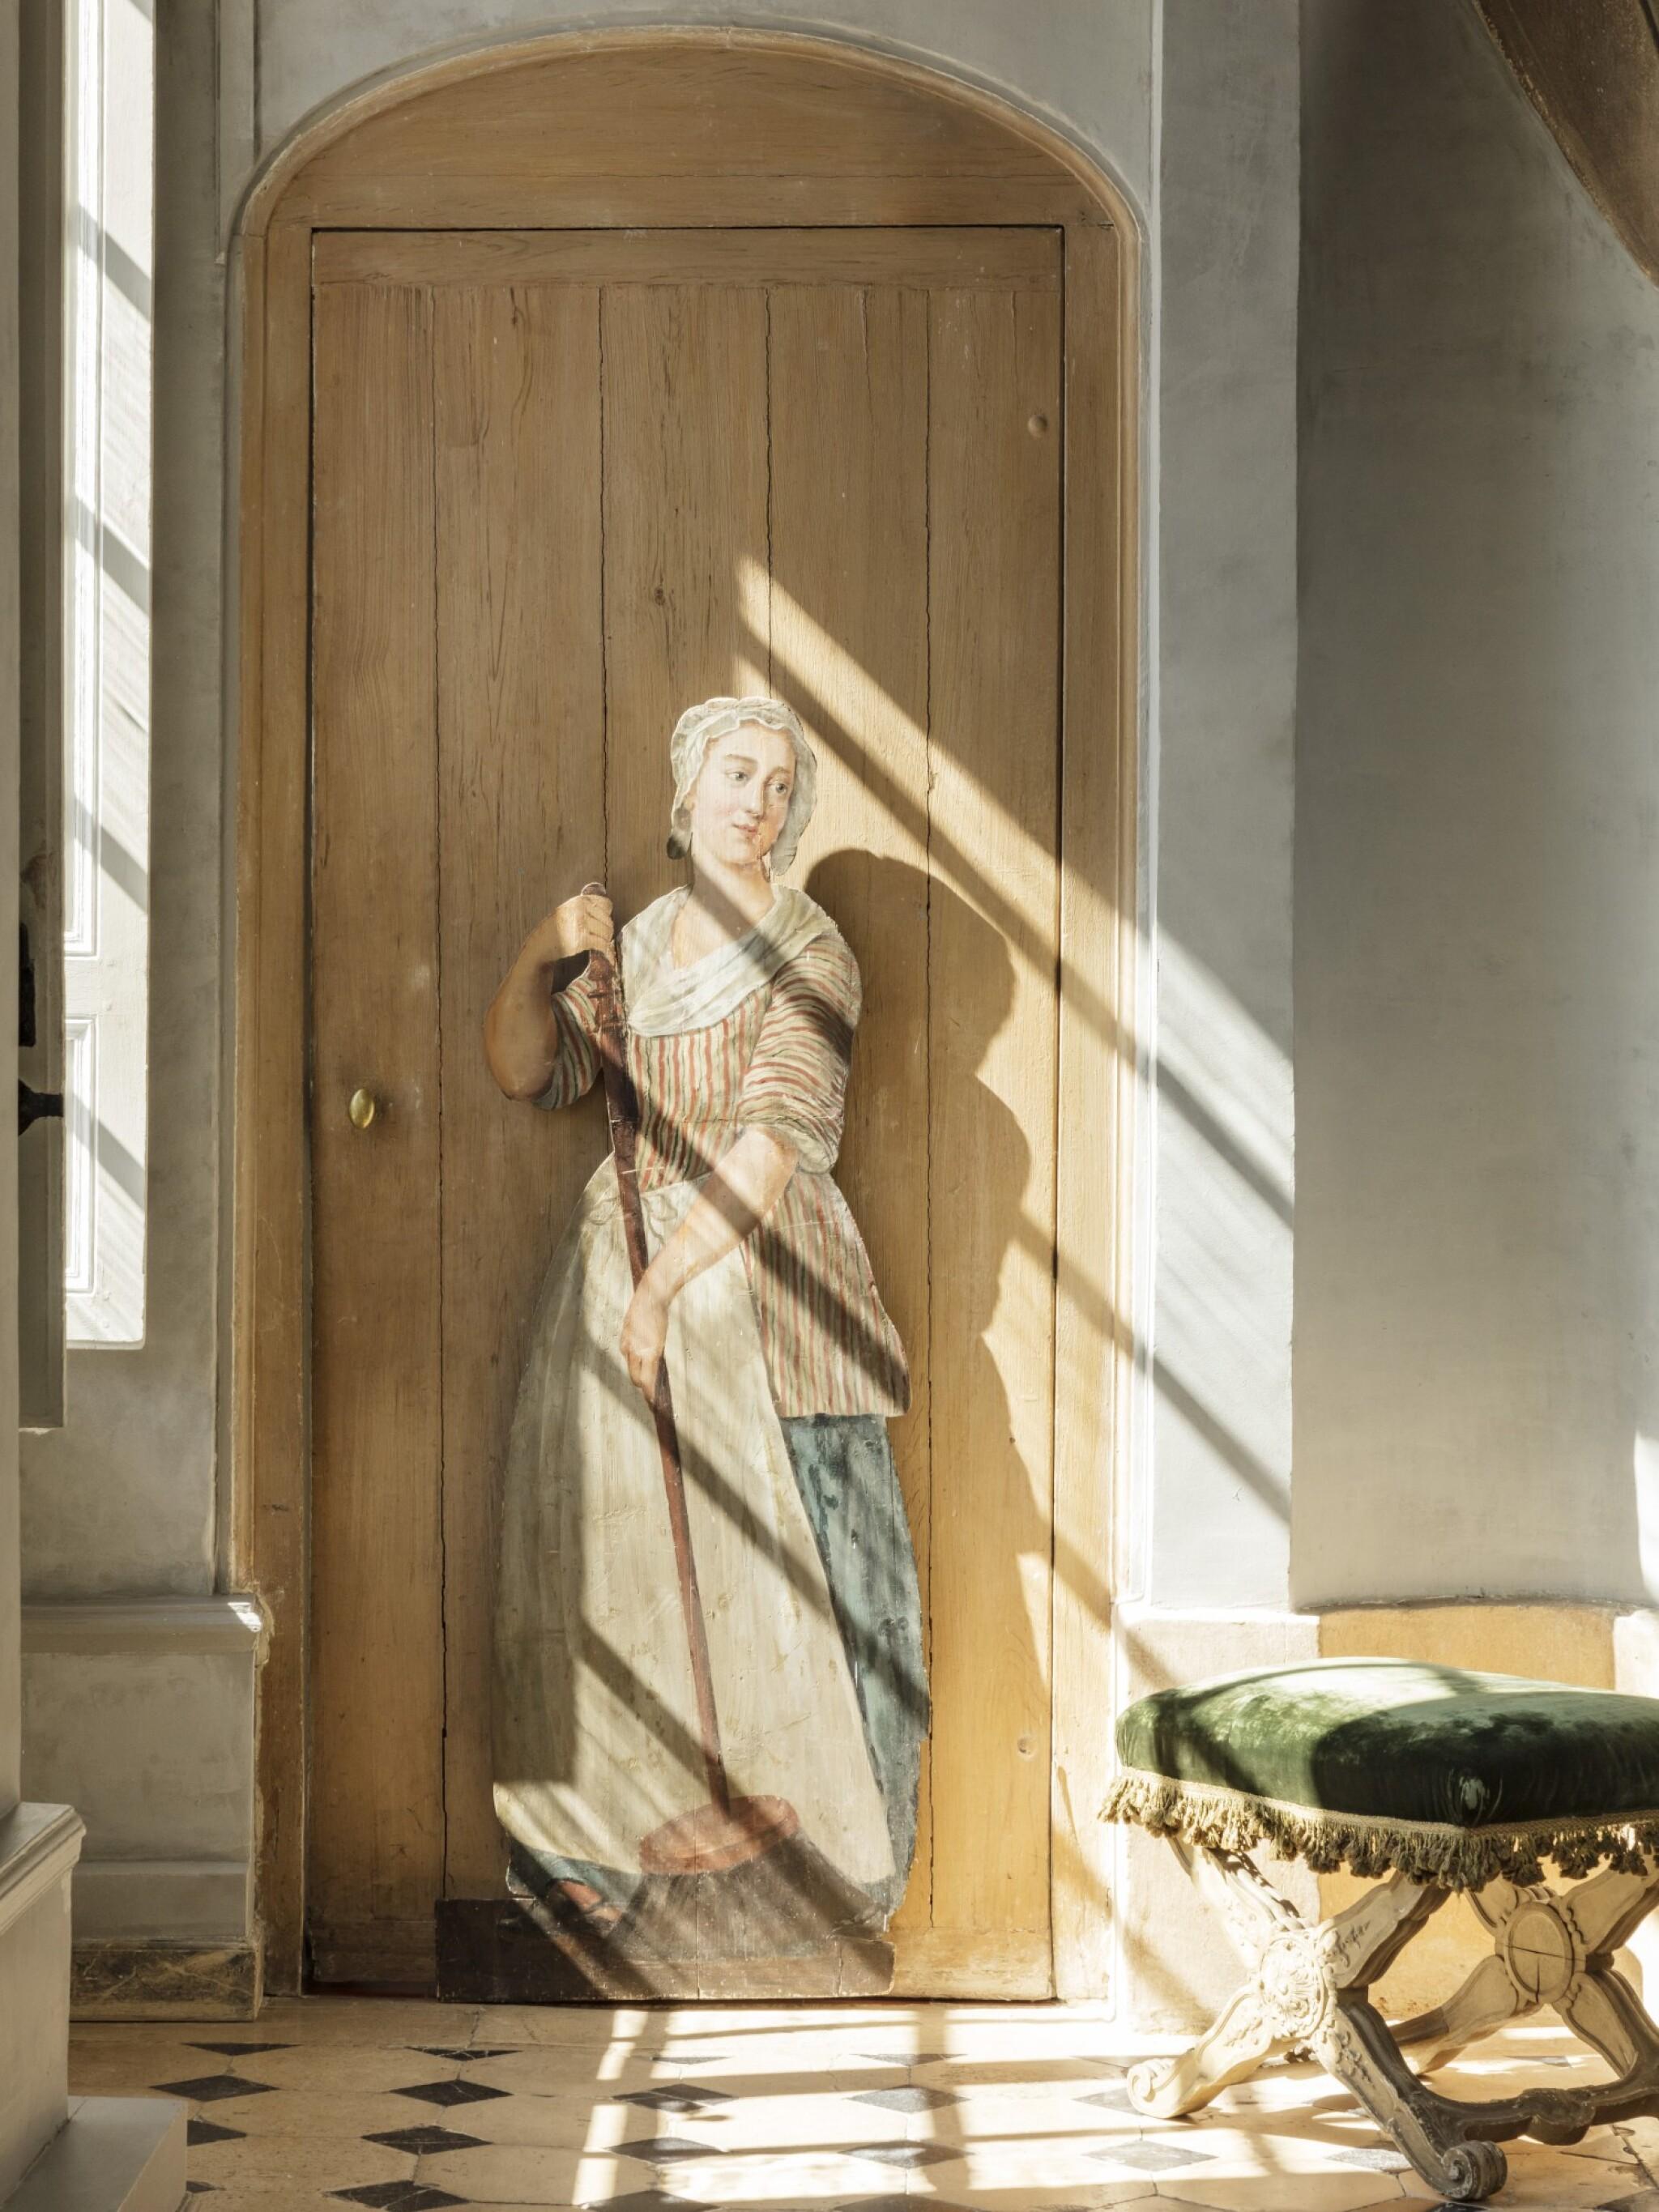 View full screen - View 1 of Lot 68. FRANCO-FLEMISH SCHOOL, LATE 18TH CENTURY | TROMPE L'OEIL : A WOMAN CLEANING [ECOLE FRANCO-HOLLANDAISE, DE LA FIN DU XVIIIE SIÈCLE |  TROMPE-L'OEIL : FEMME BALAYANT].